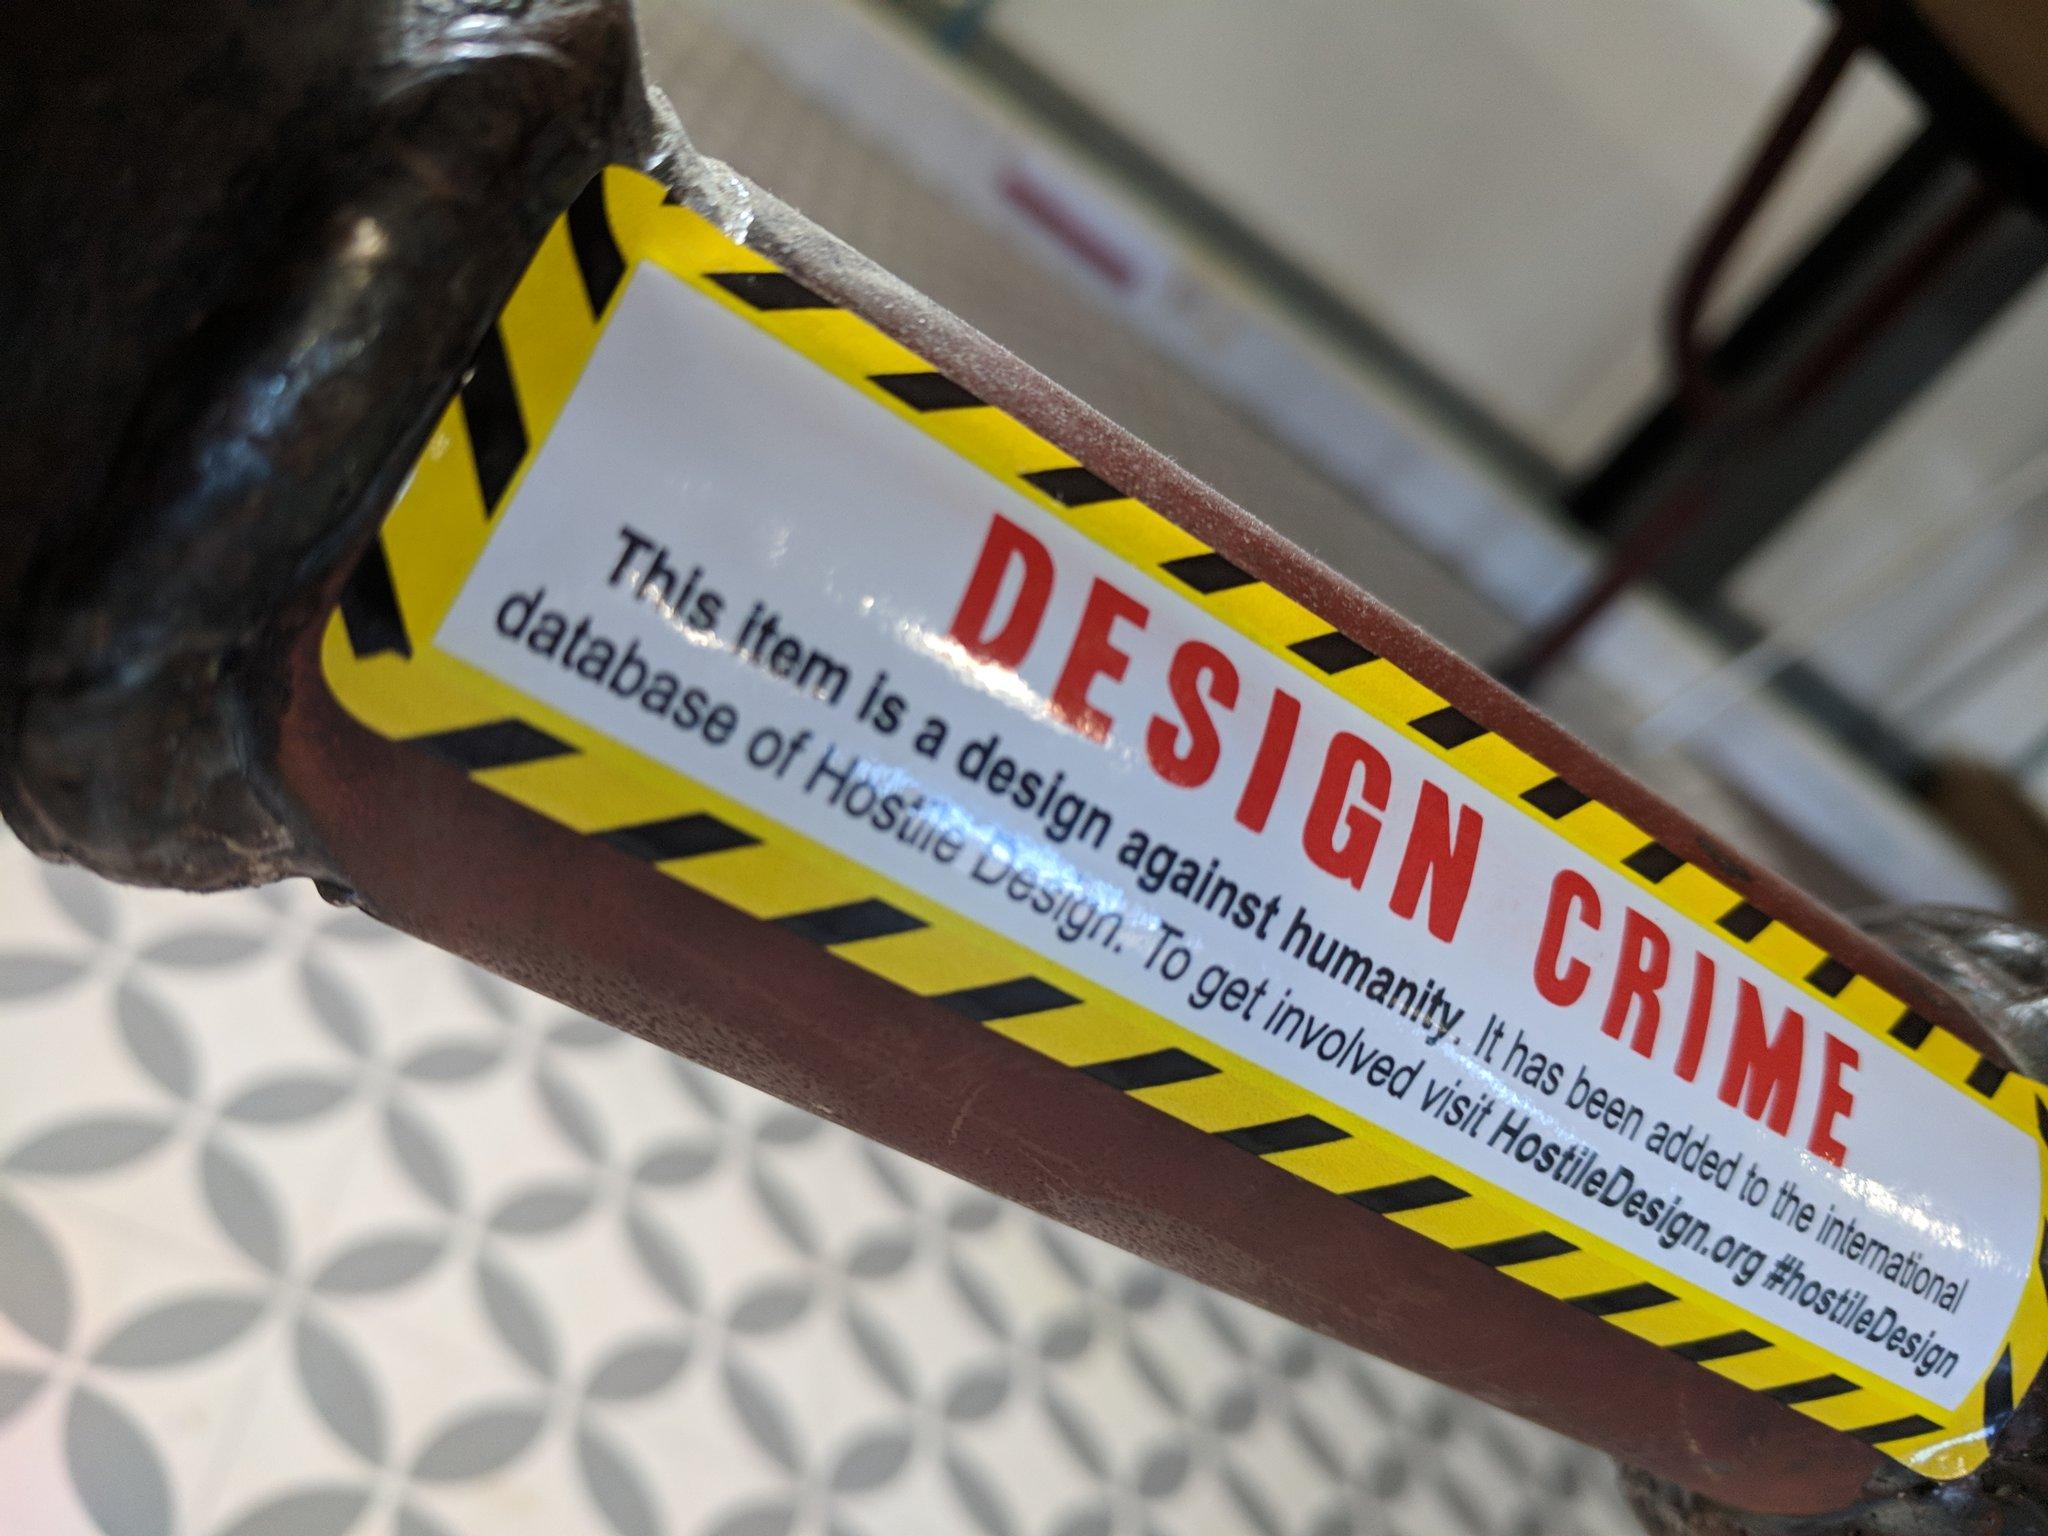 Hostile Architecture Design Crimes Campaign Gets Bars